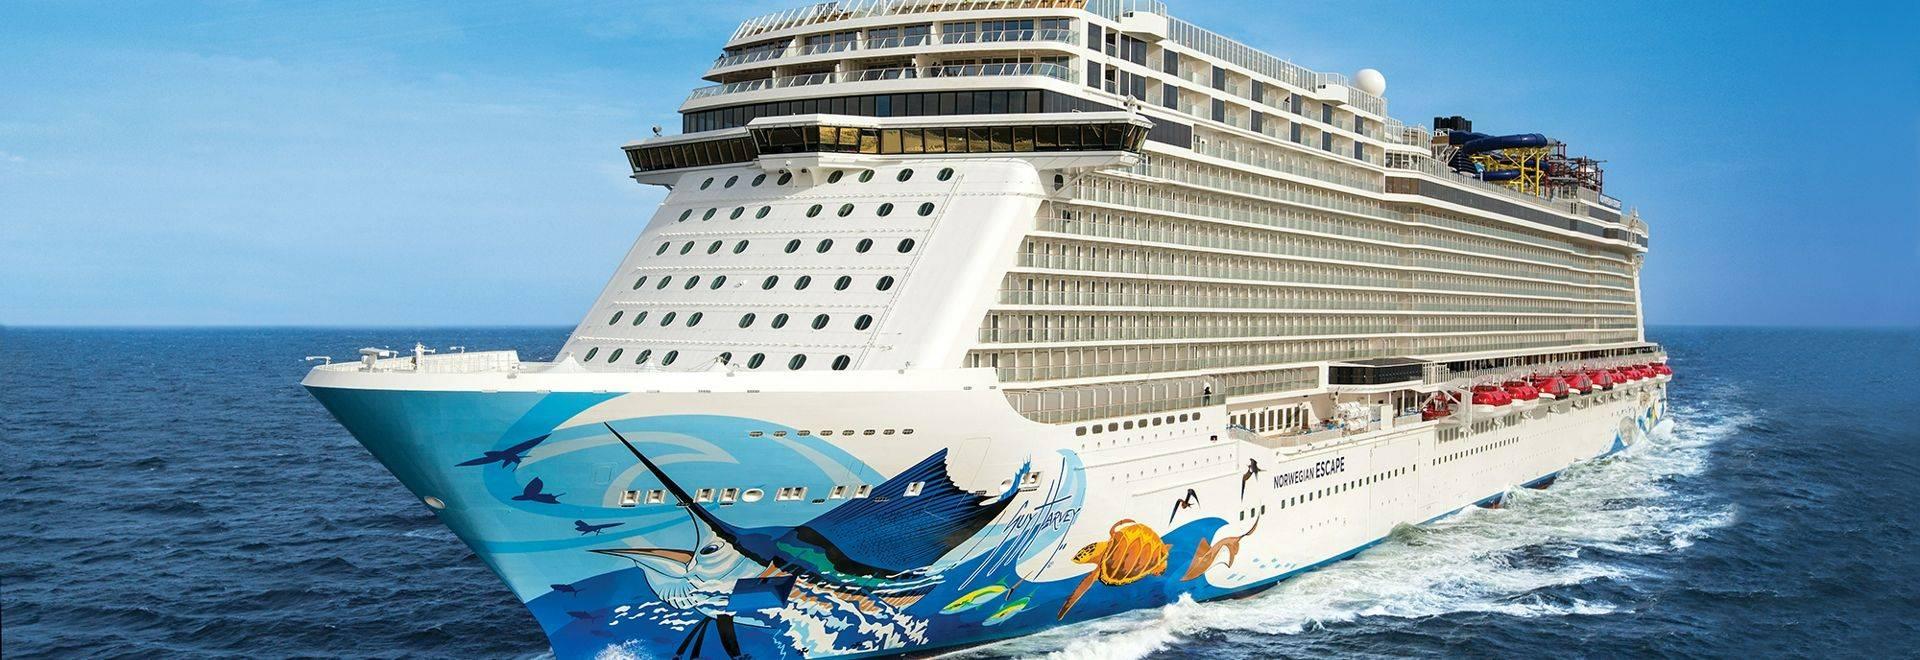 Norwegian Escape during Sea Trials along the coast of NorwayNorwegian Cruise Line